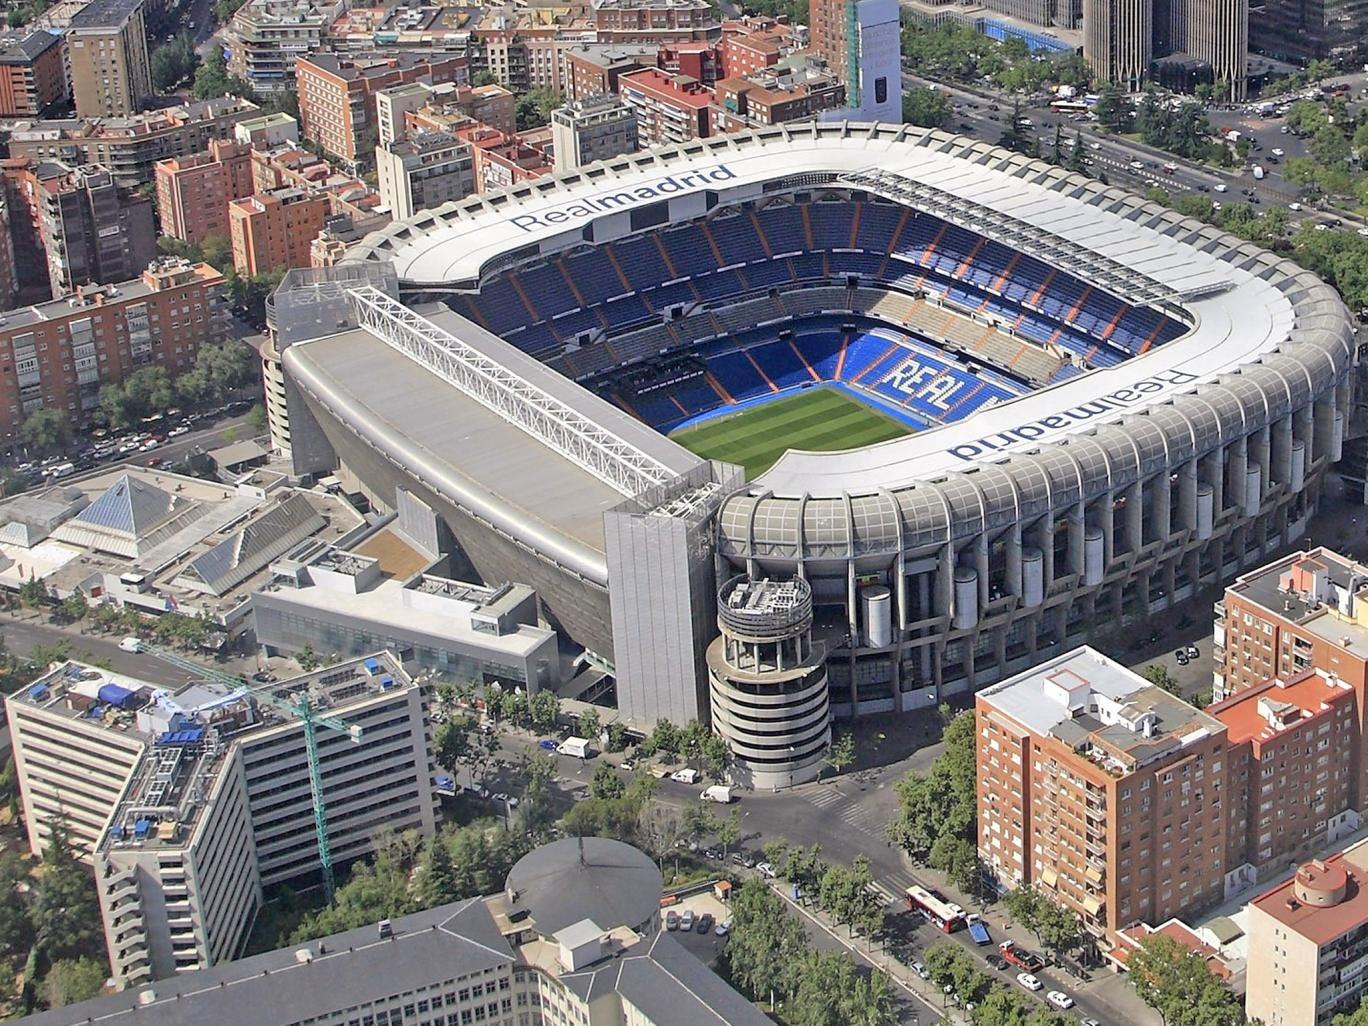 The Santiago Bernabeu stadium, home of Real Madrid